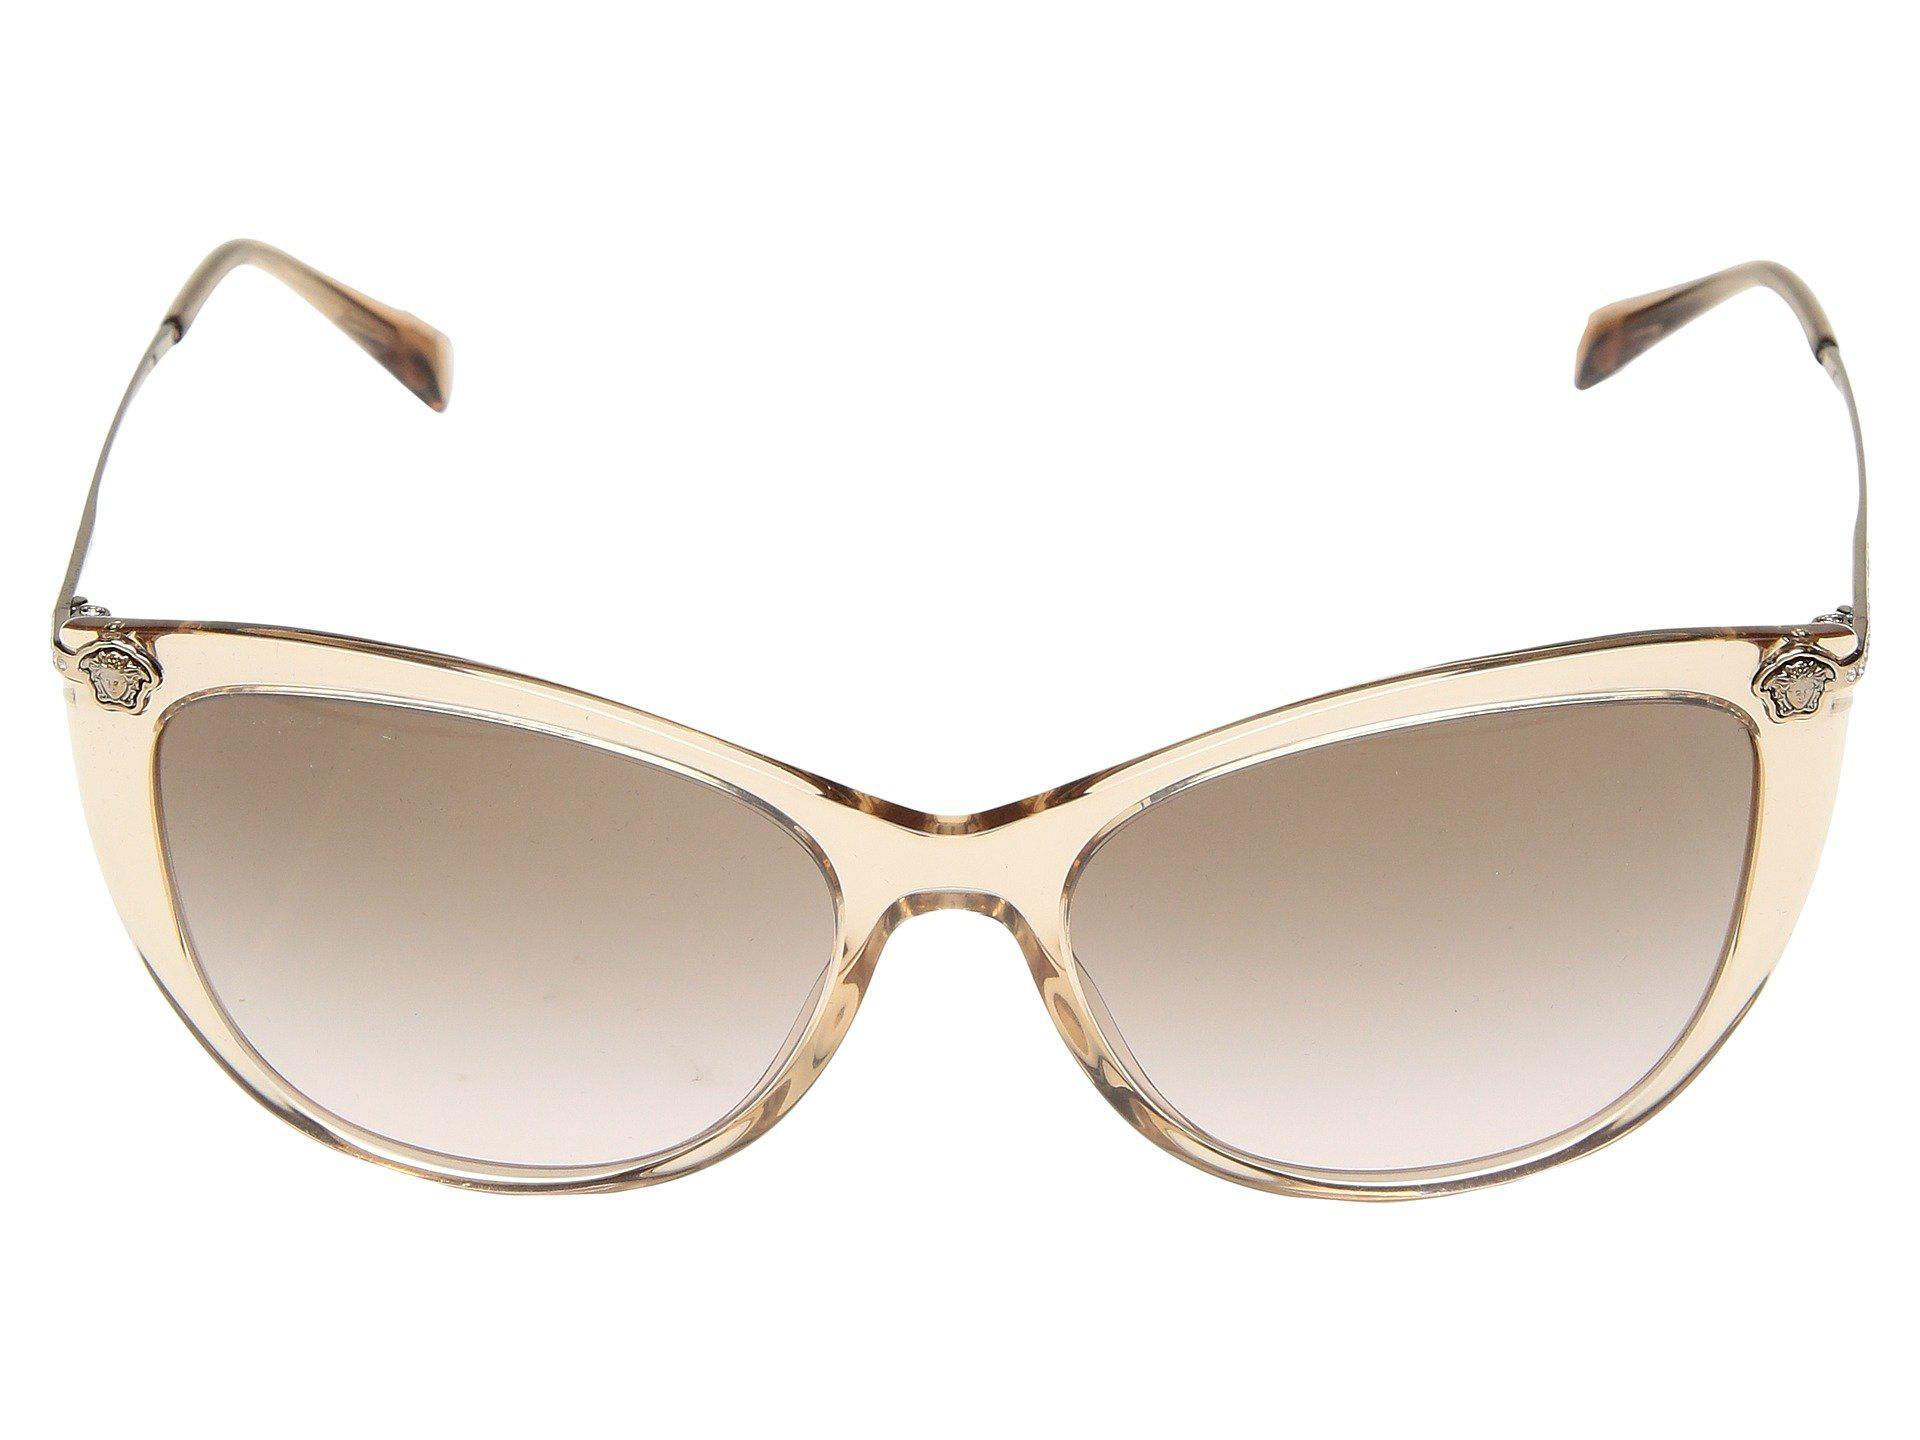 0d184bc16b Versace - Ve4345b (havana gradient Brown Mirror) Fashion Sunglasses - Lyst.  View fullscreen